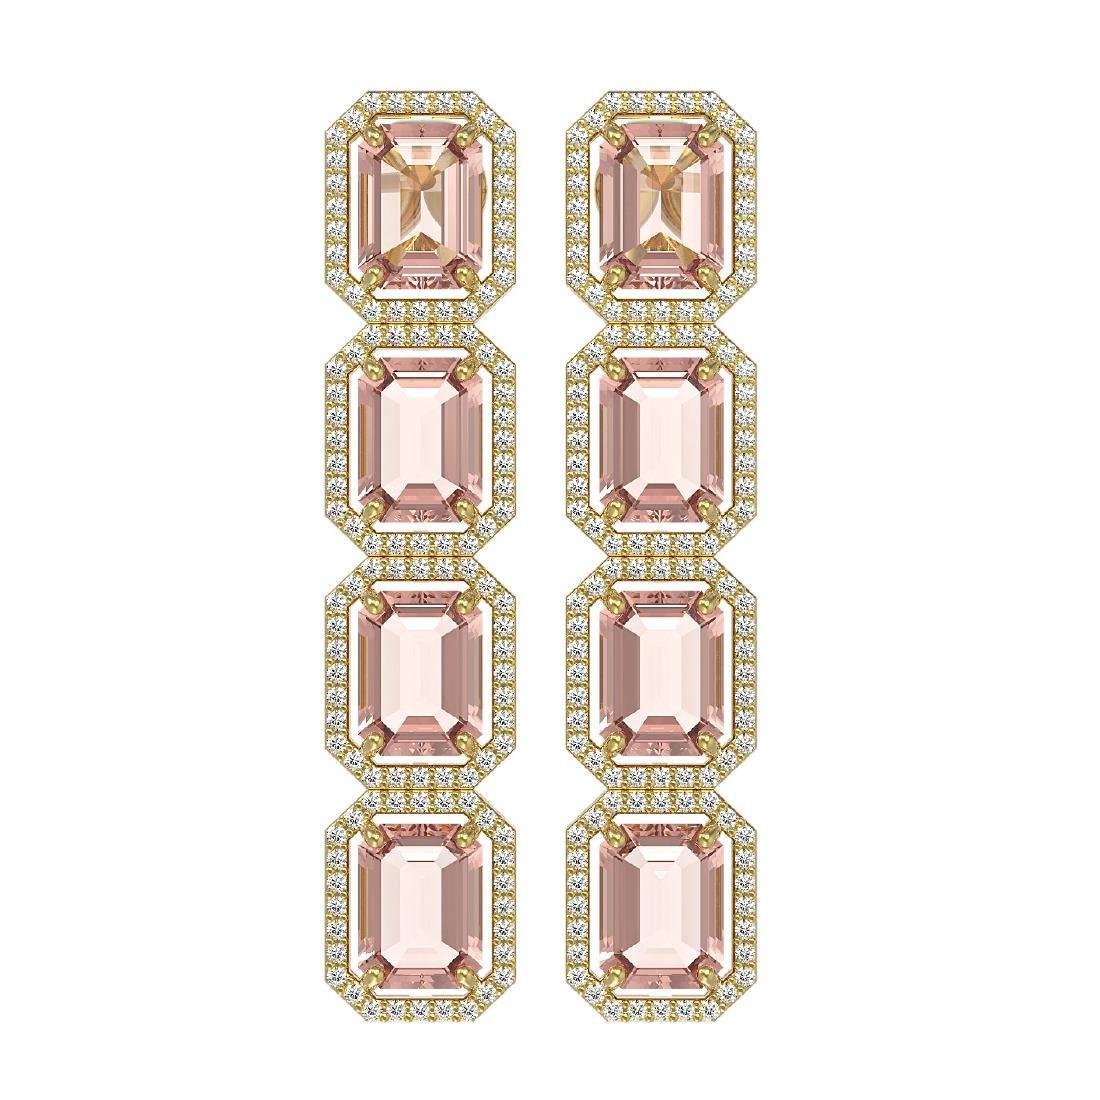 19.81 CTW Morganite & Diamond Halo Earrings 10K Yellow